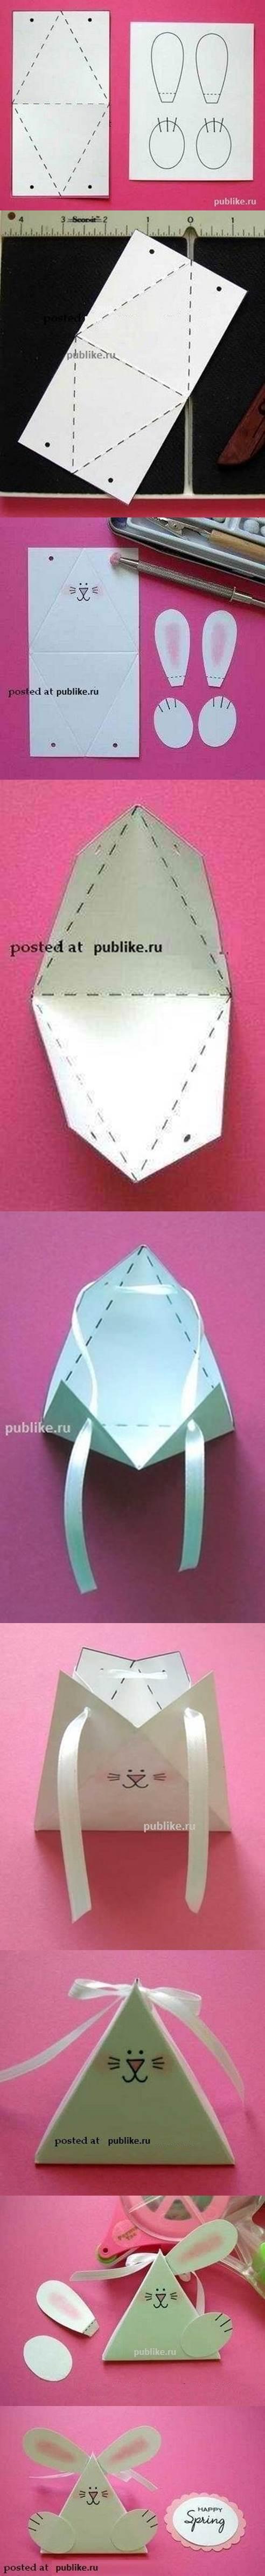 DIY Cute Paper Bunny Gift Box 2